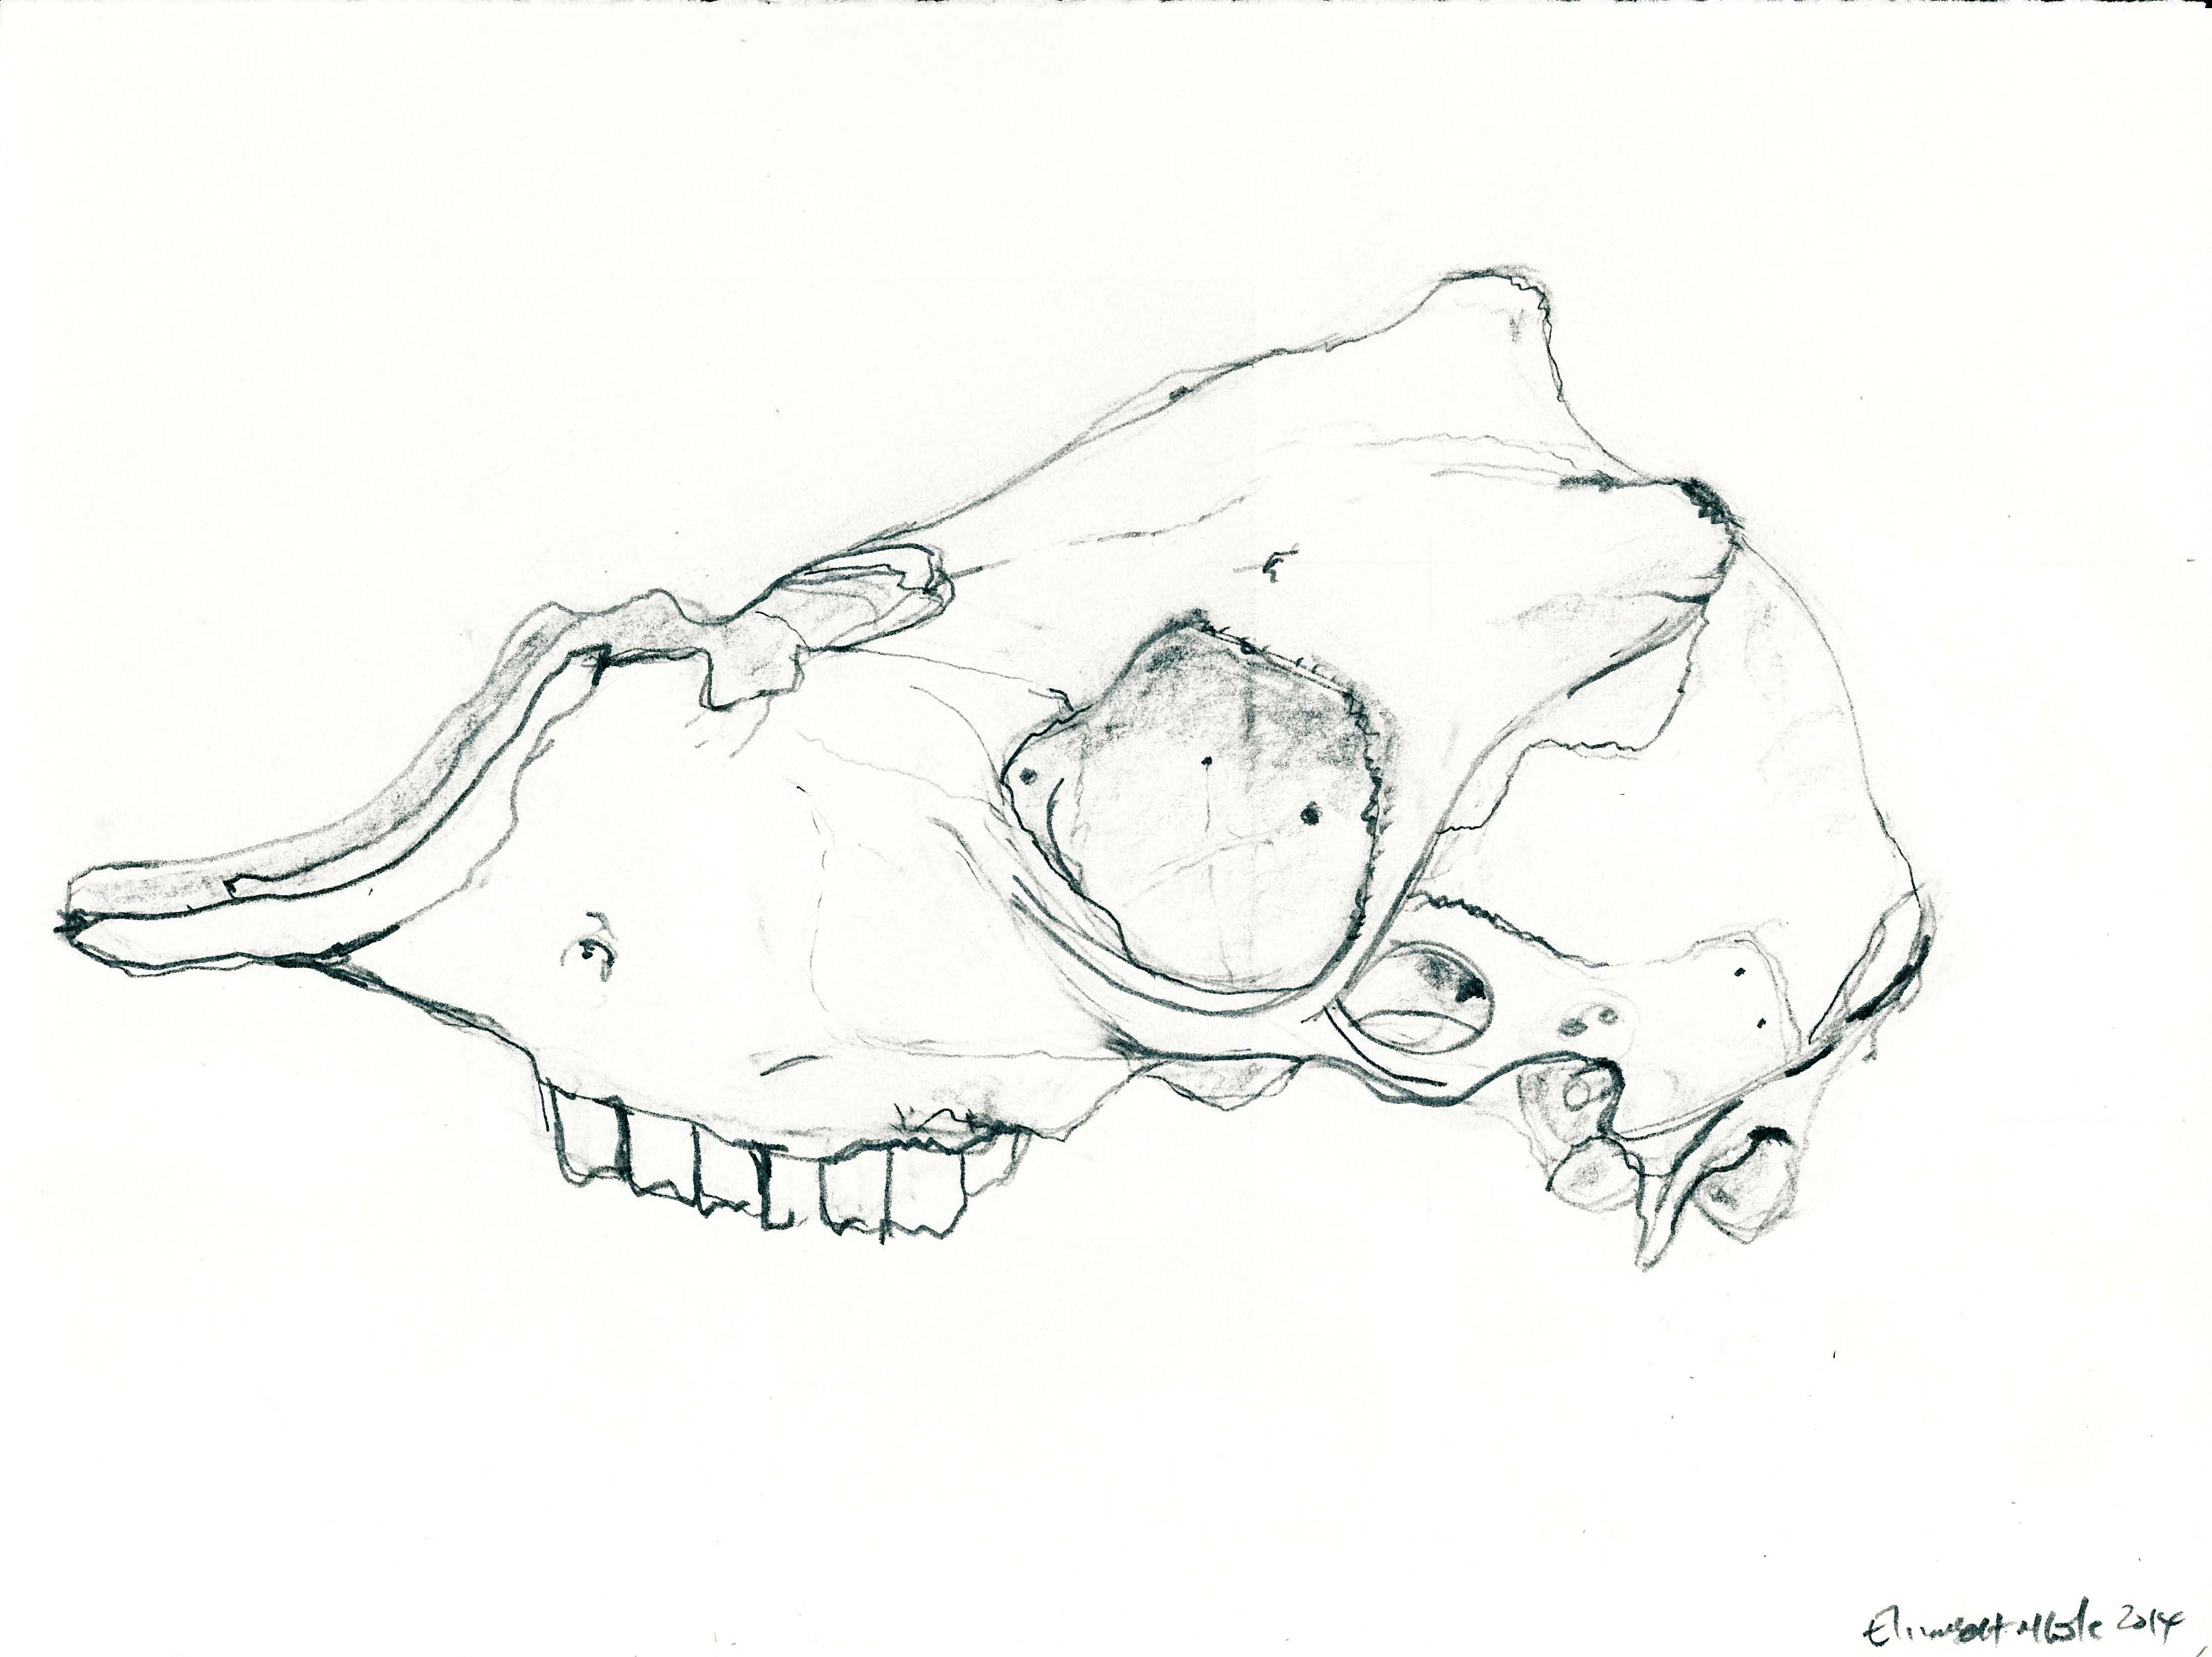 3284x2460 Drawing 2014 Lamb's Skull Side On X 2 Elizabeth M. Cole Artist